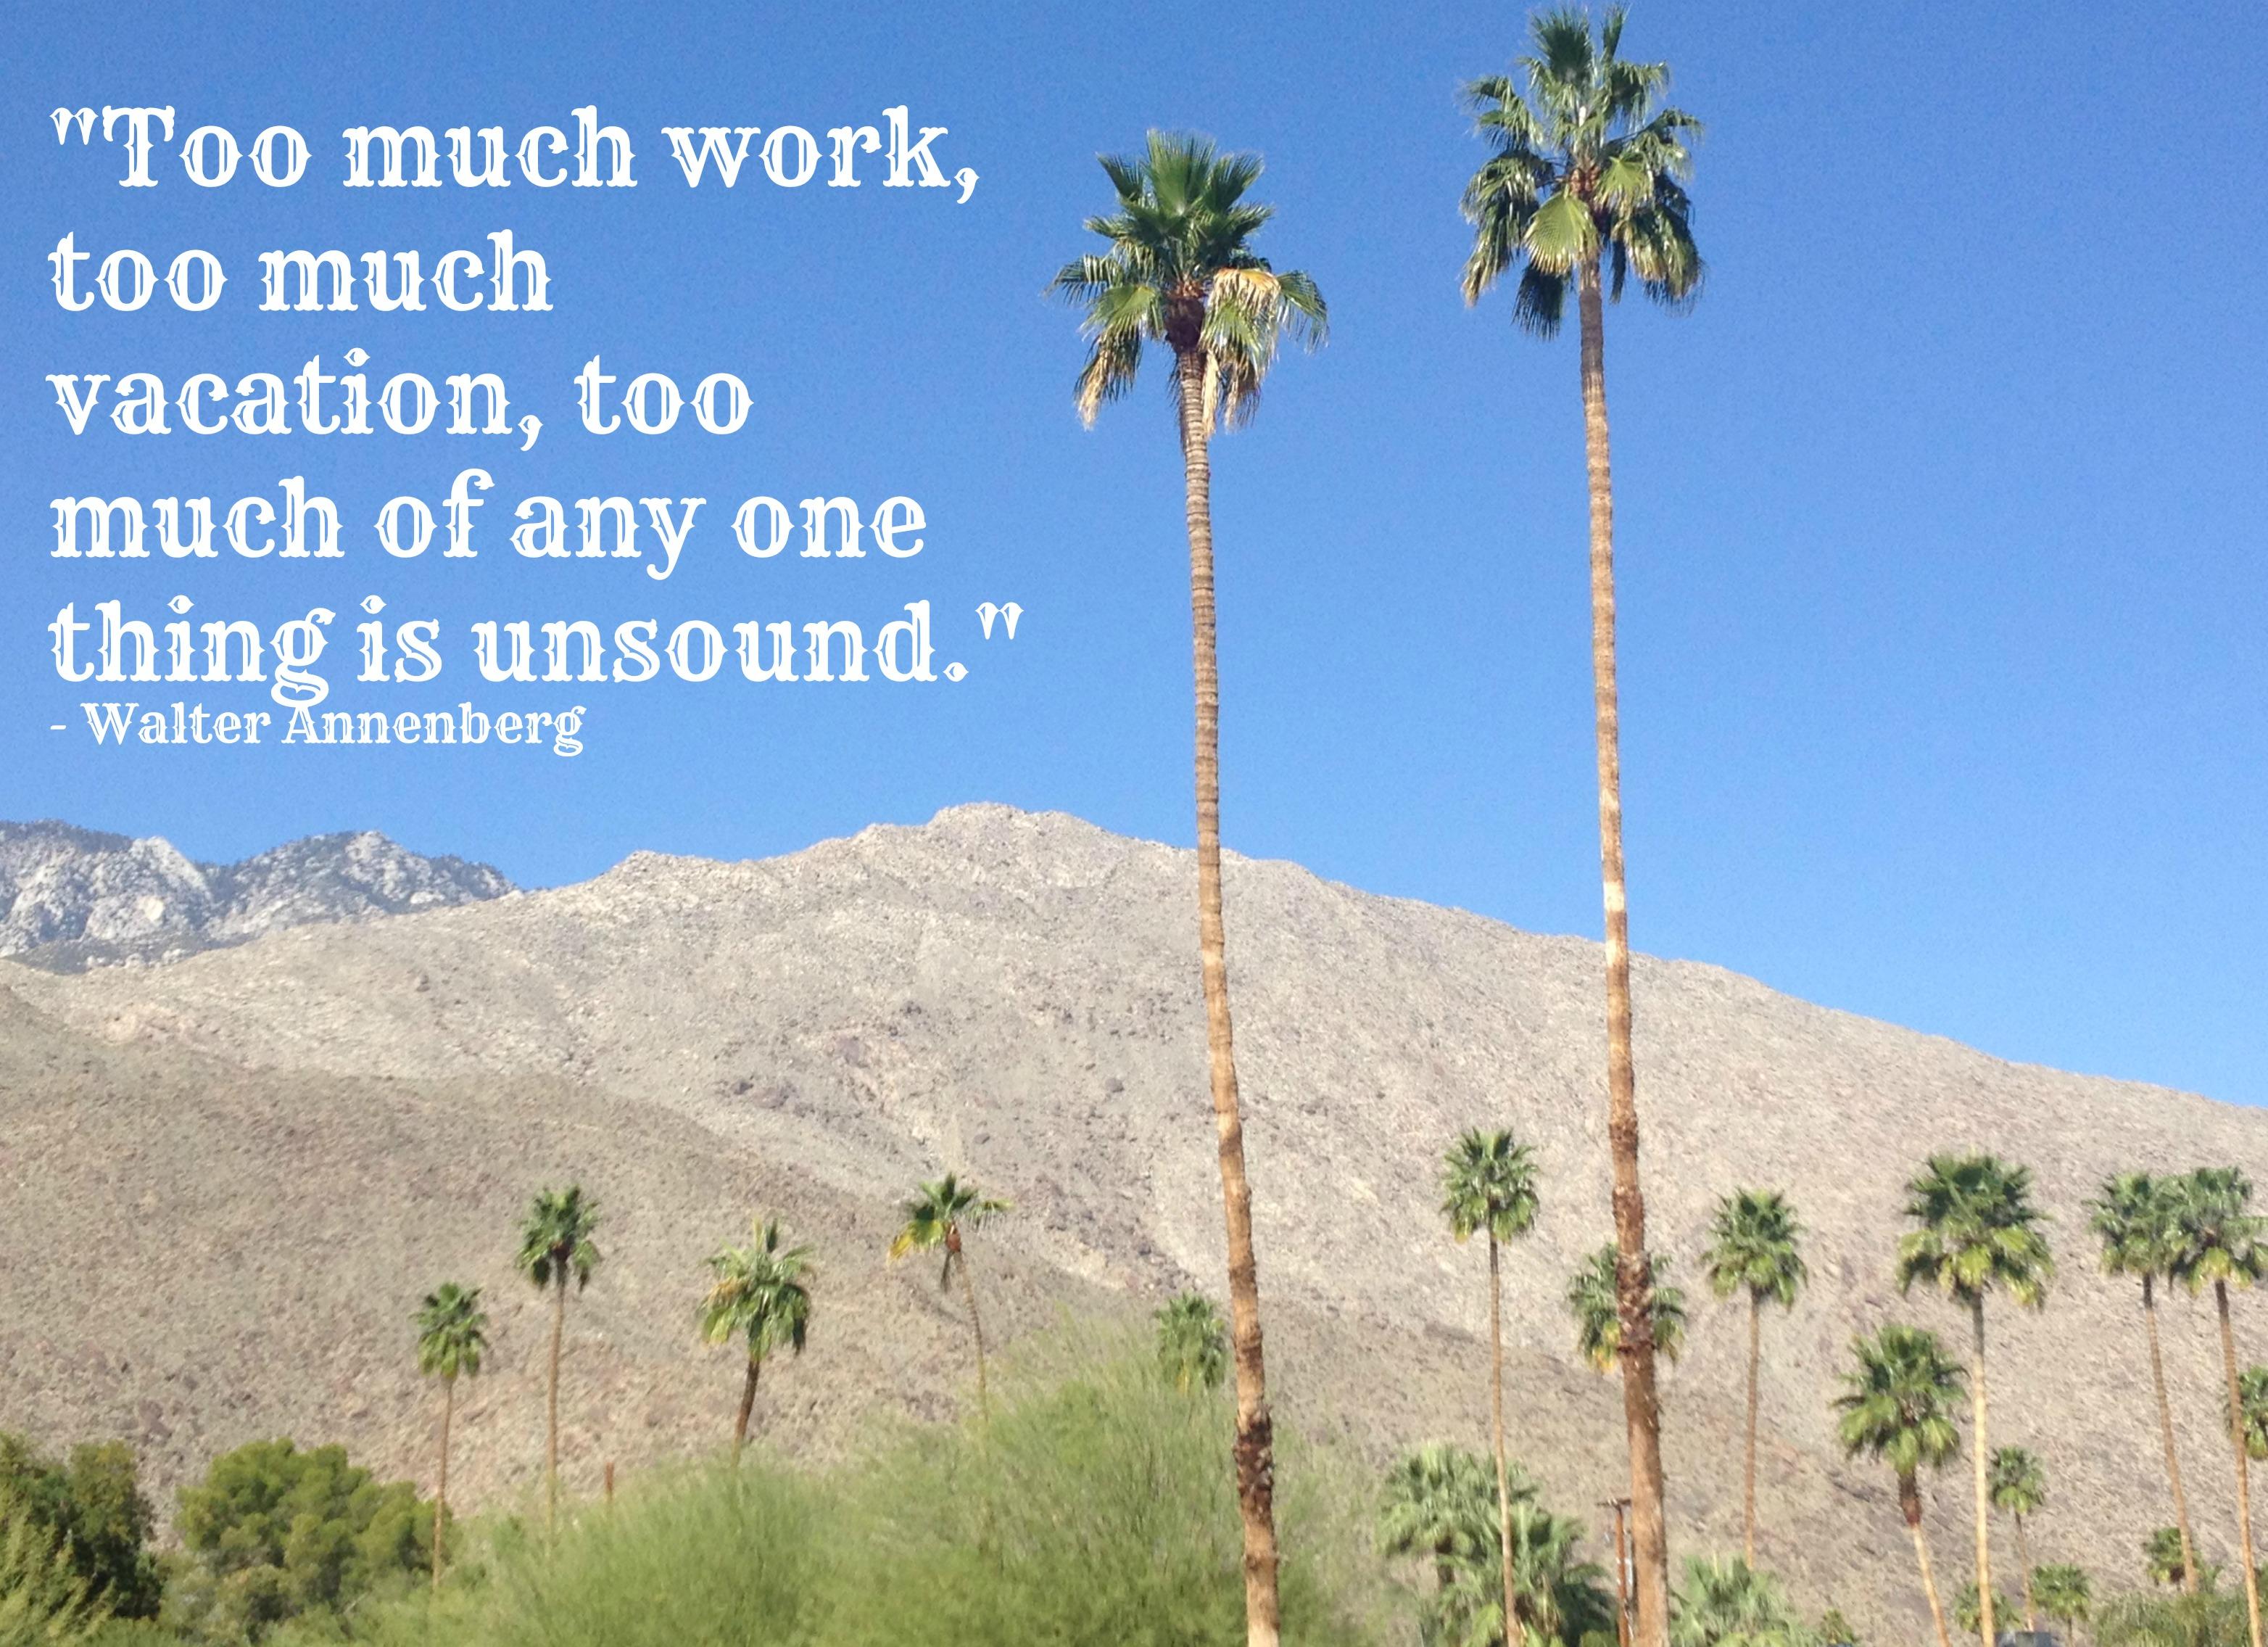 Walter Annenberg's quote #4